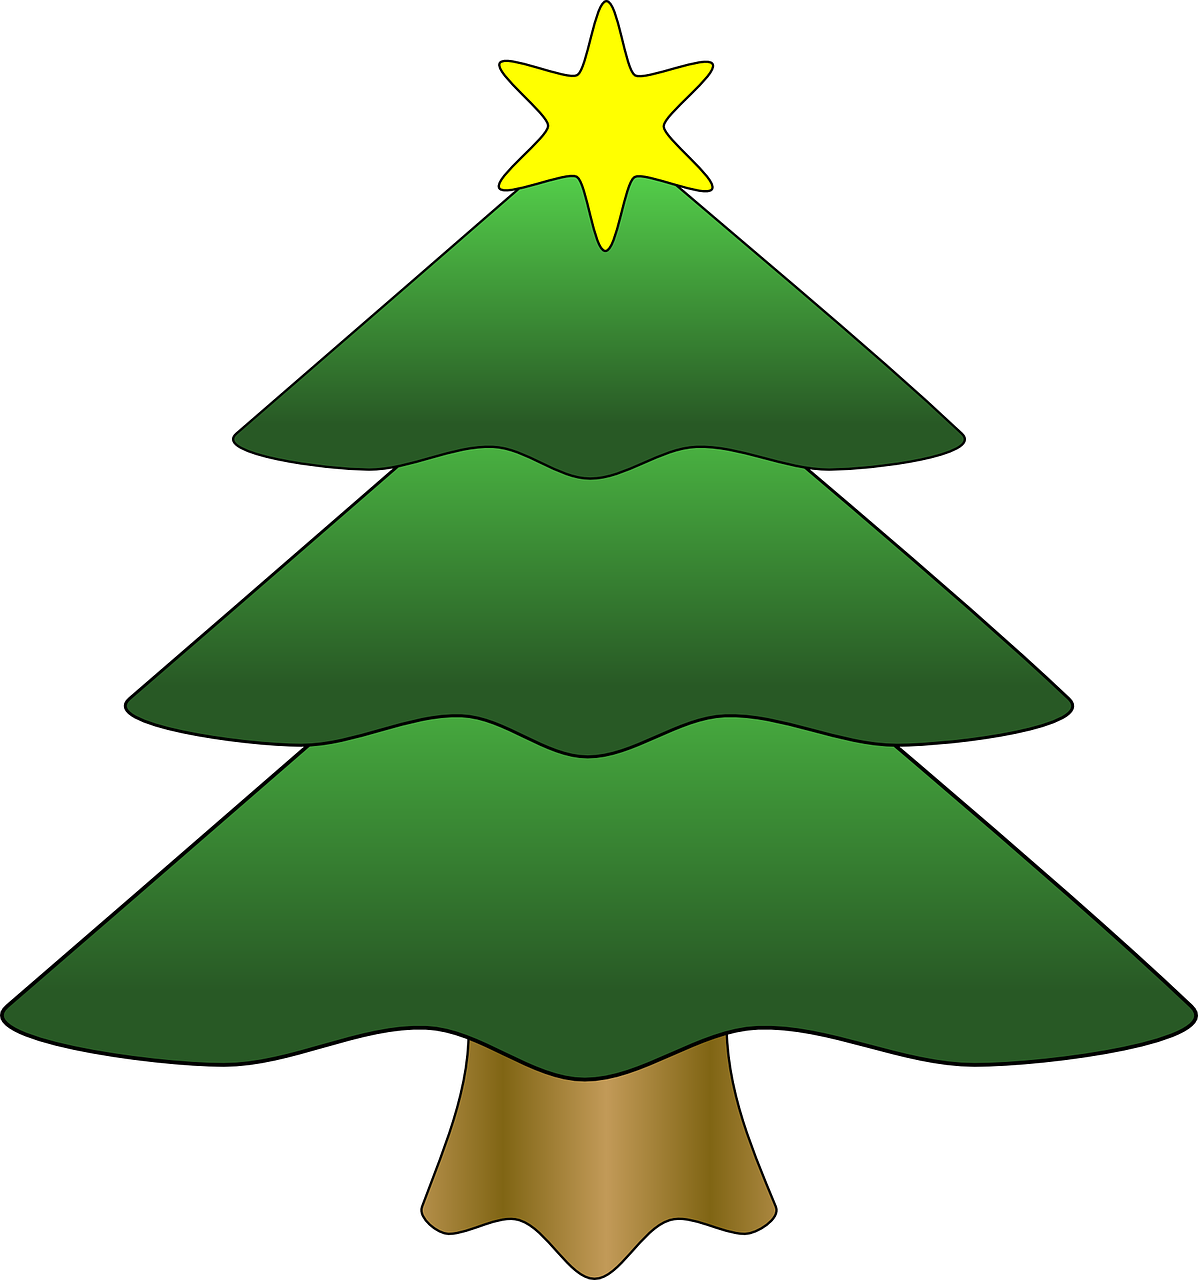 Vacation Tree Christmas Star Gold Xmas Vacation Tree Christmas Star Gold Xmas Cartoon Christmas Tree Holiday Christmas Tree Christmas Tree